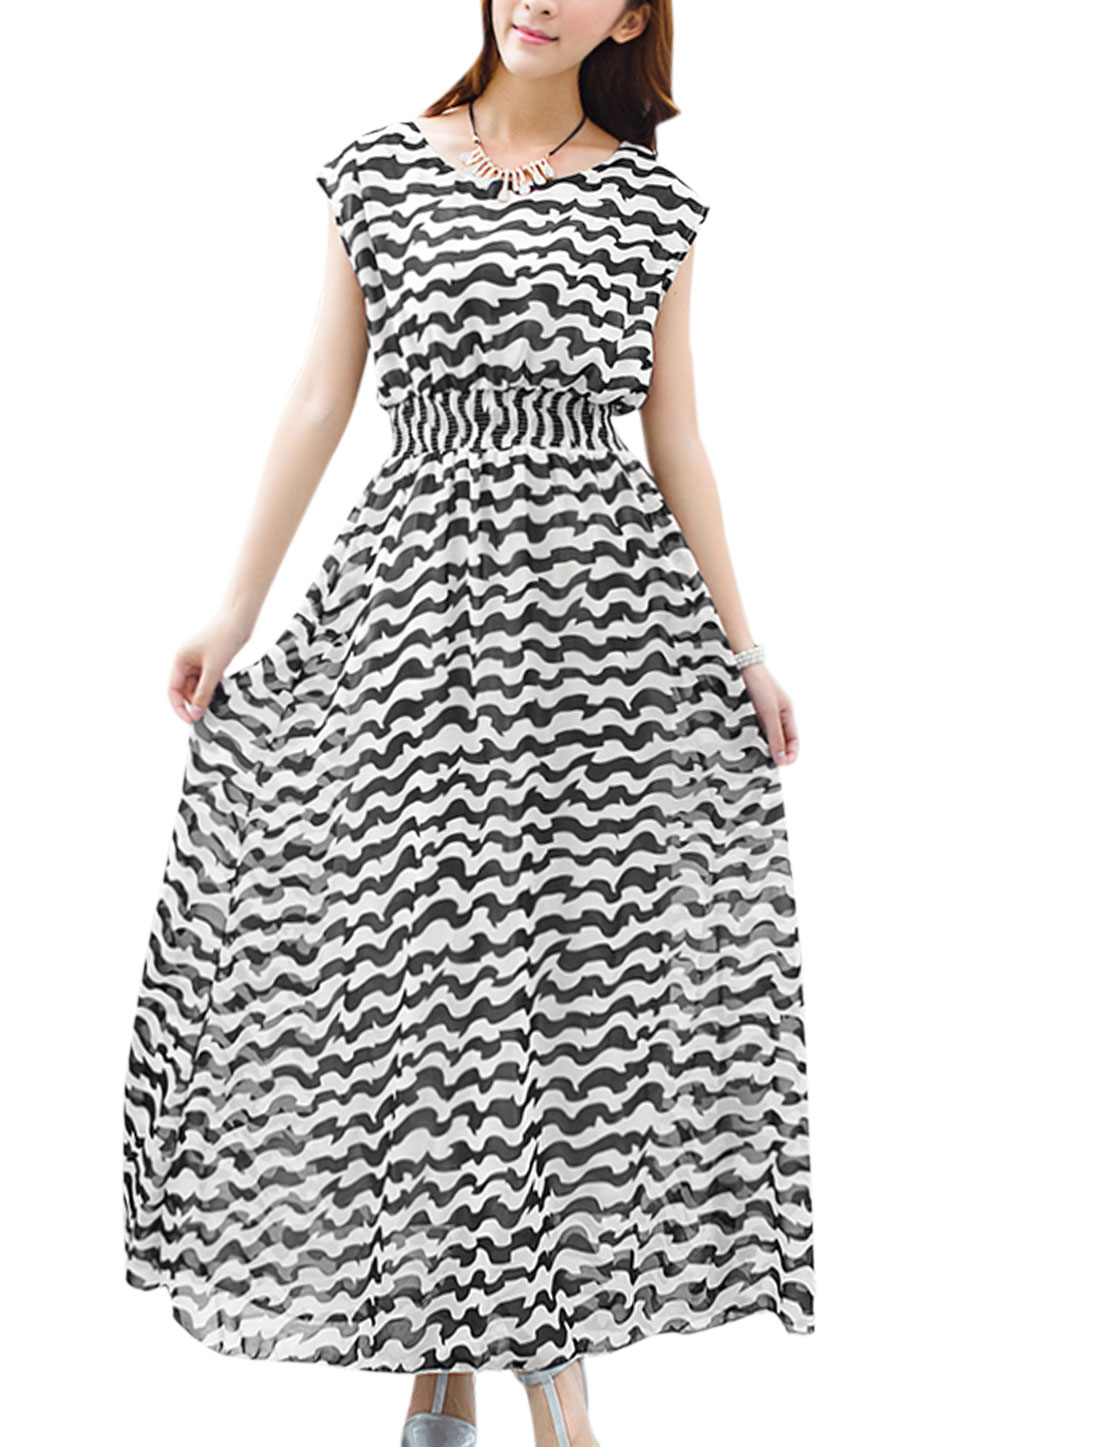 Women Chic Empire Waist Ruffled Design Chiffon Tank Dress Black White XS